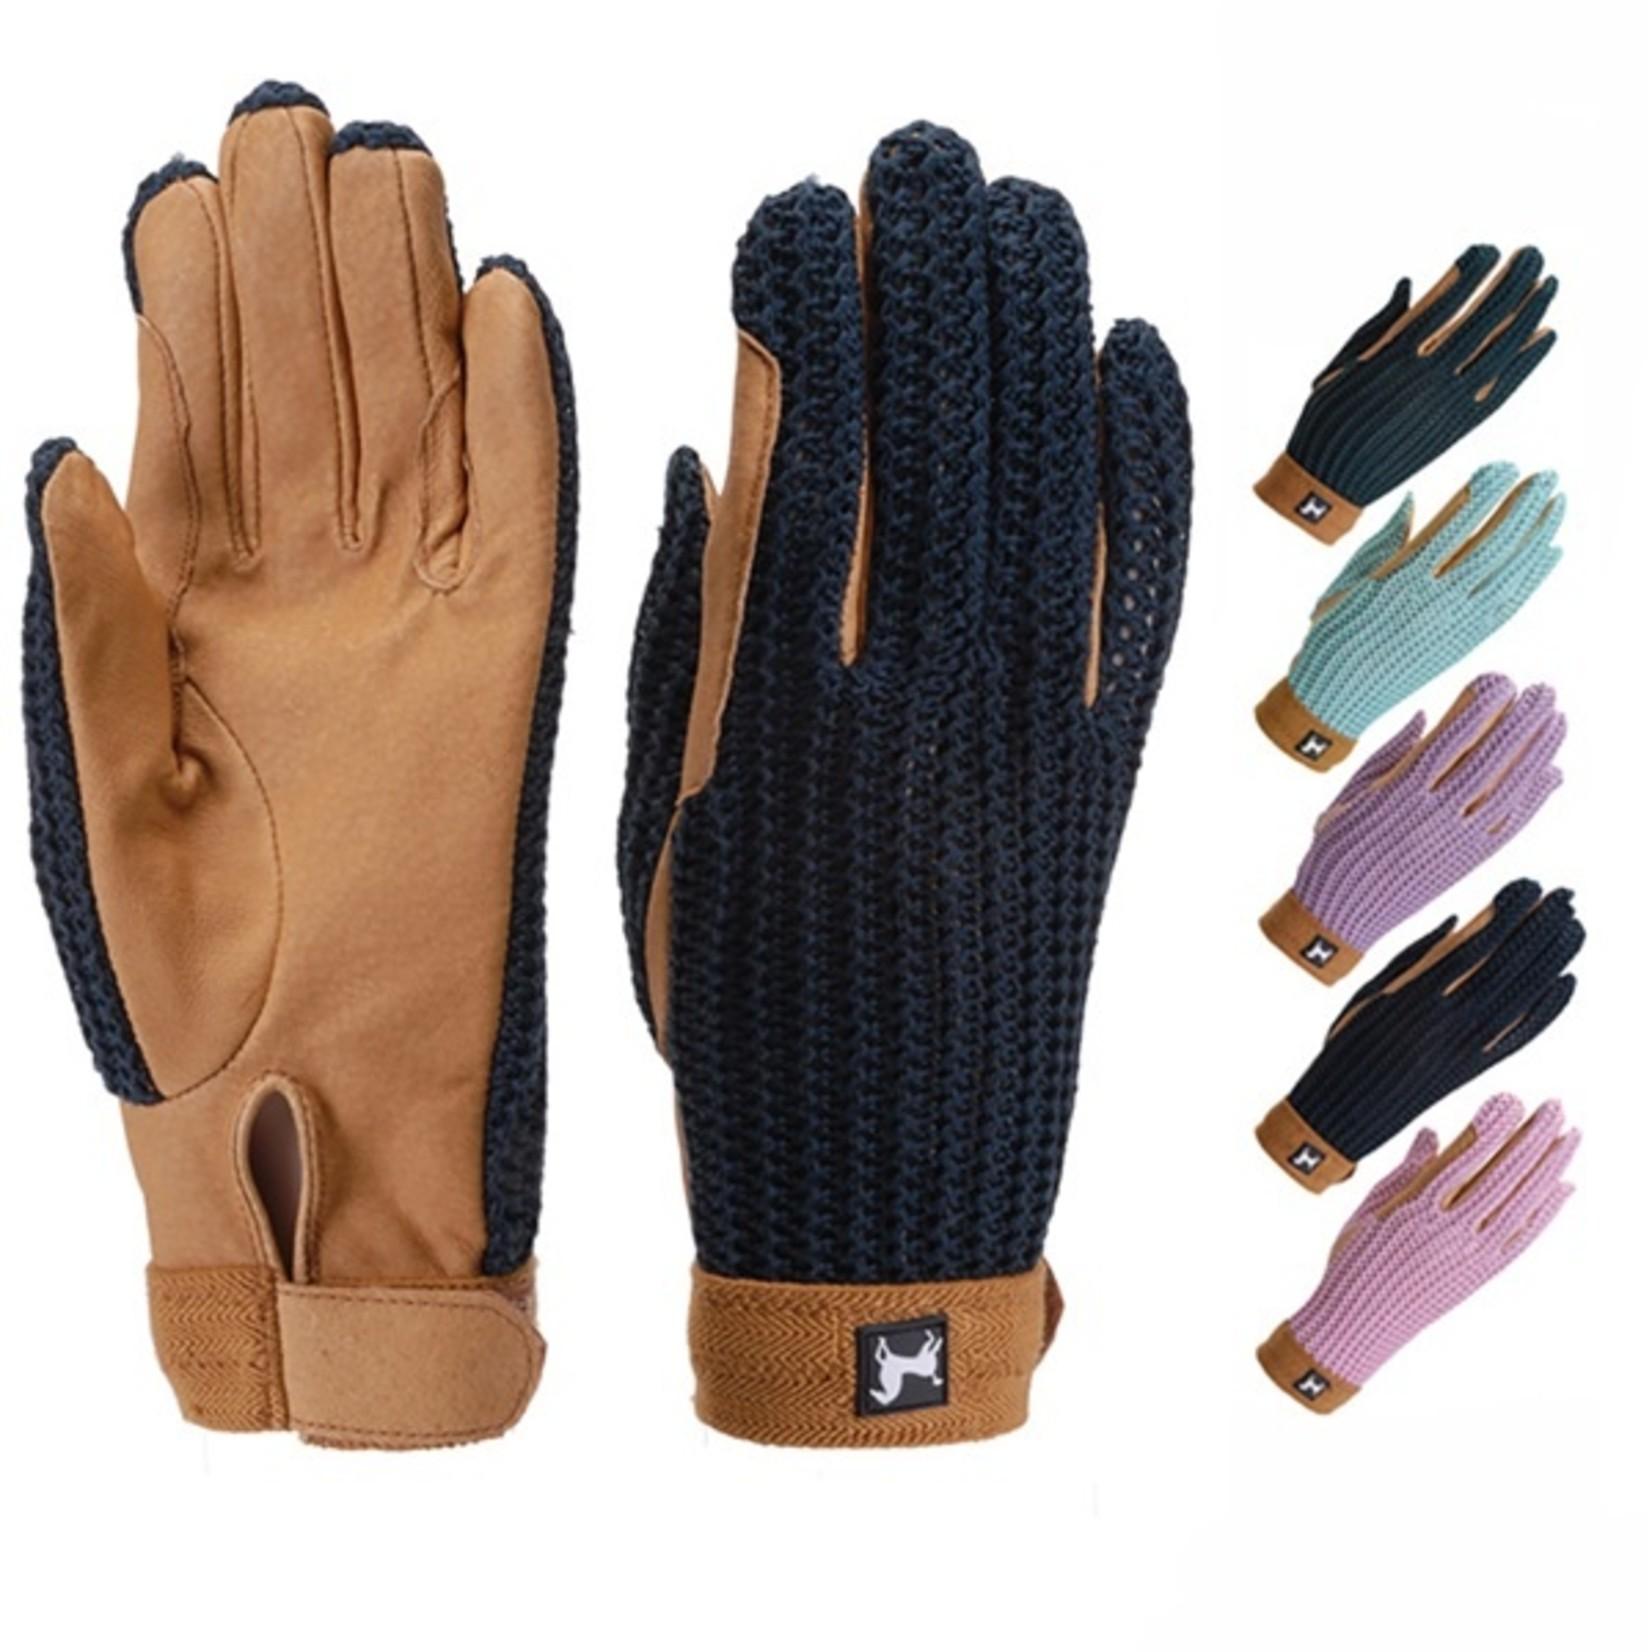 Crochet Glove - Grey